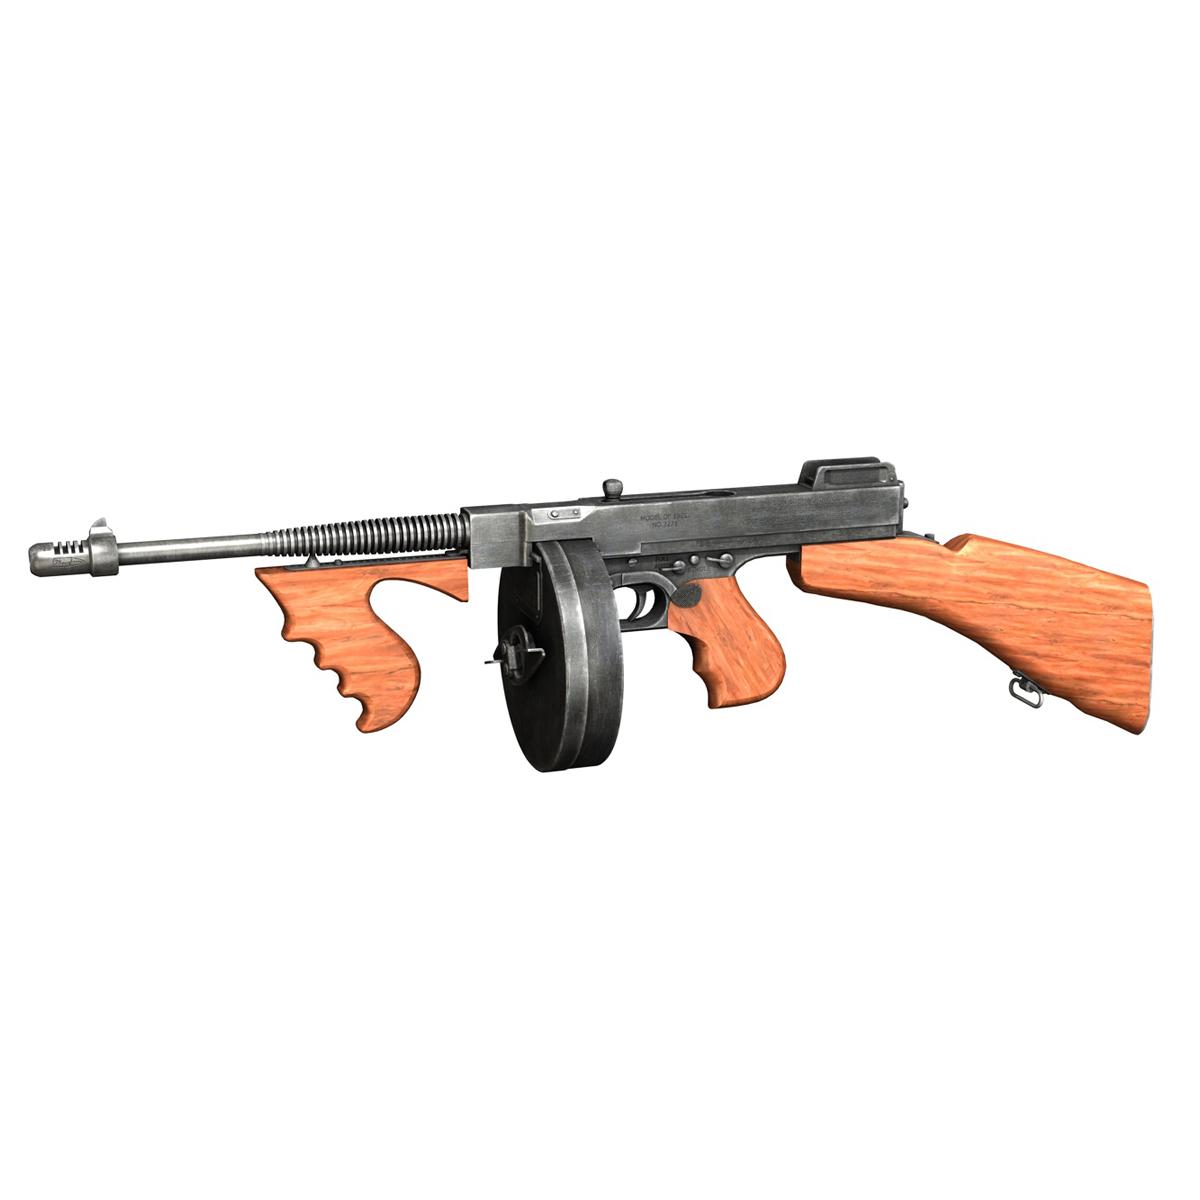 colt model1921 thompson submachine gun 3d model 3ds c4d lwo obj 264710